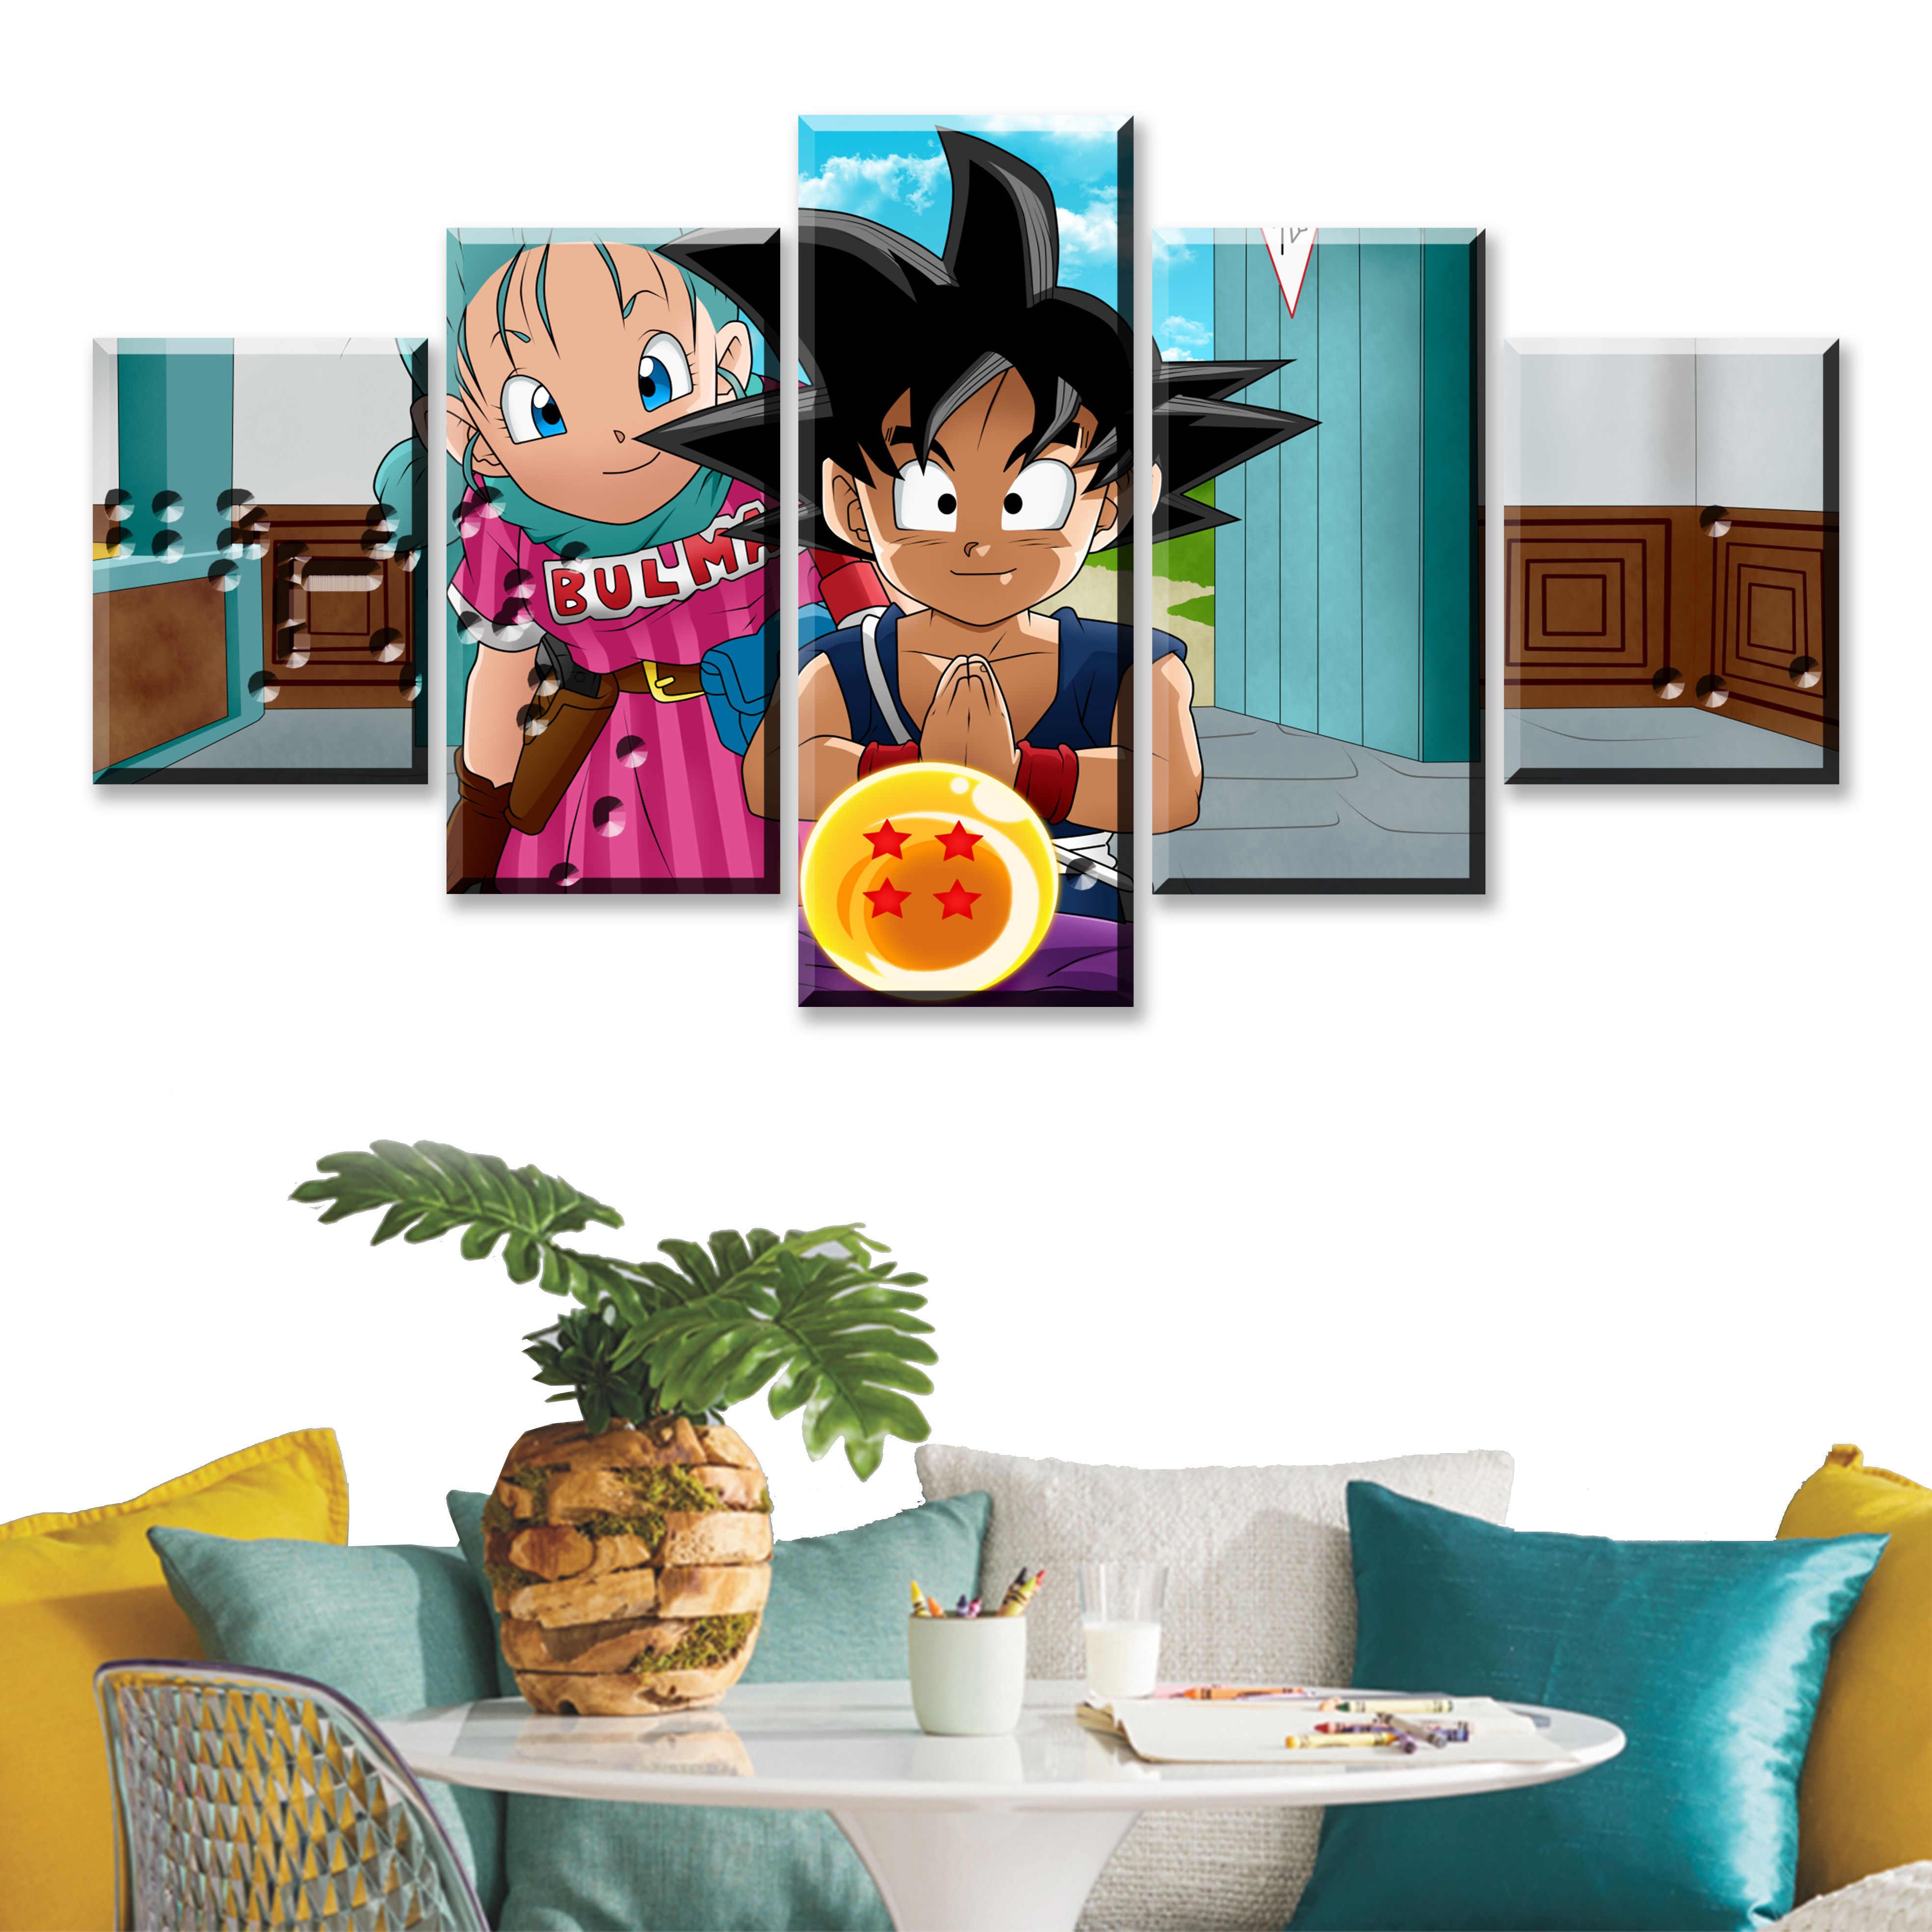 HD הדפסי בד תמונות מודרני קיר אמנות 5 חתיכות קריקטורה Z ציורי גוקו נסיעה Shenron פוסטר בית תפאורה מסגרת